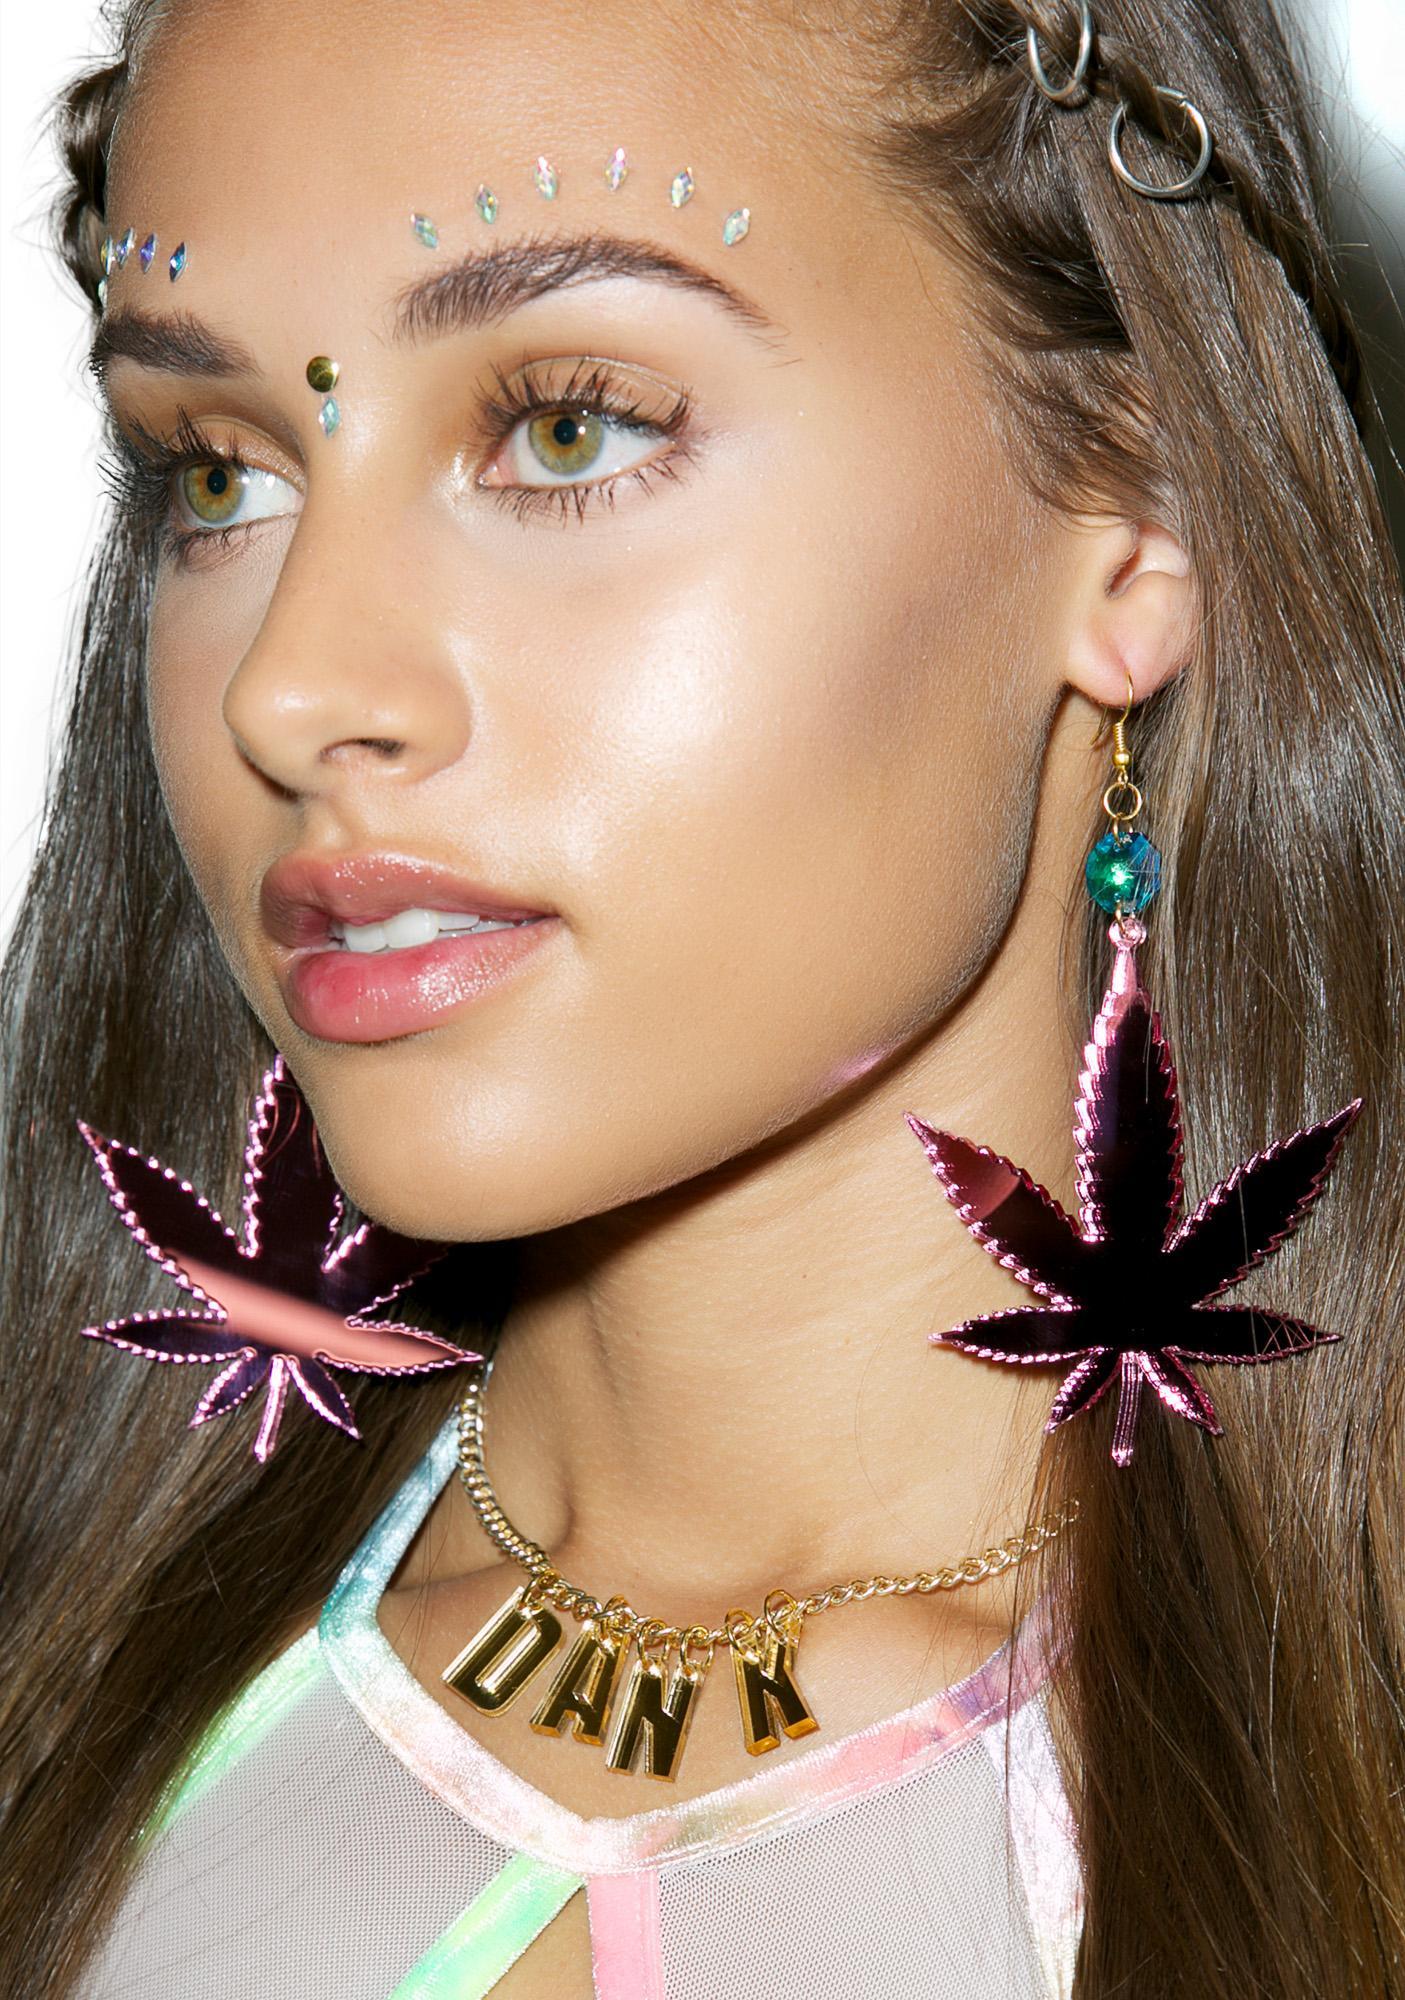 Trixy Starr Irie Weed Earrings